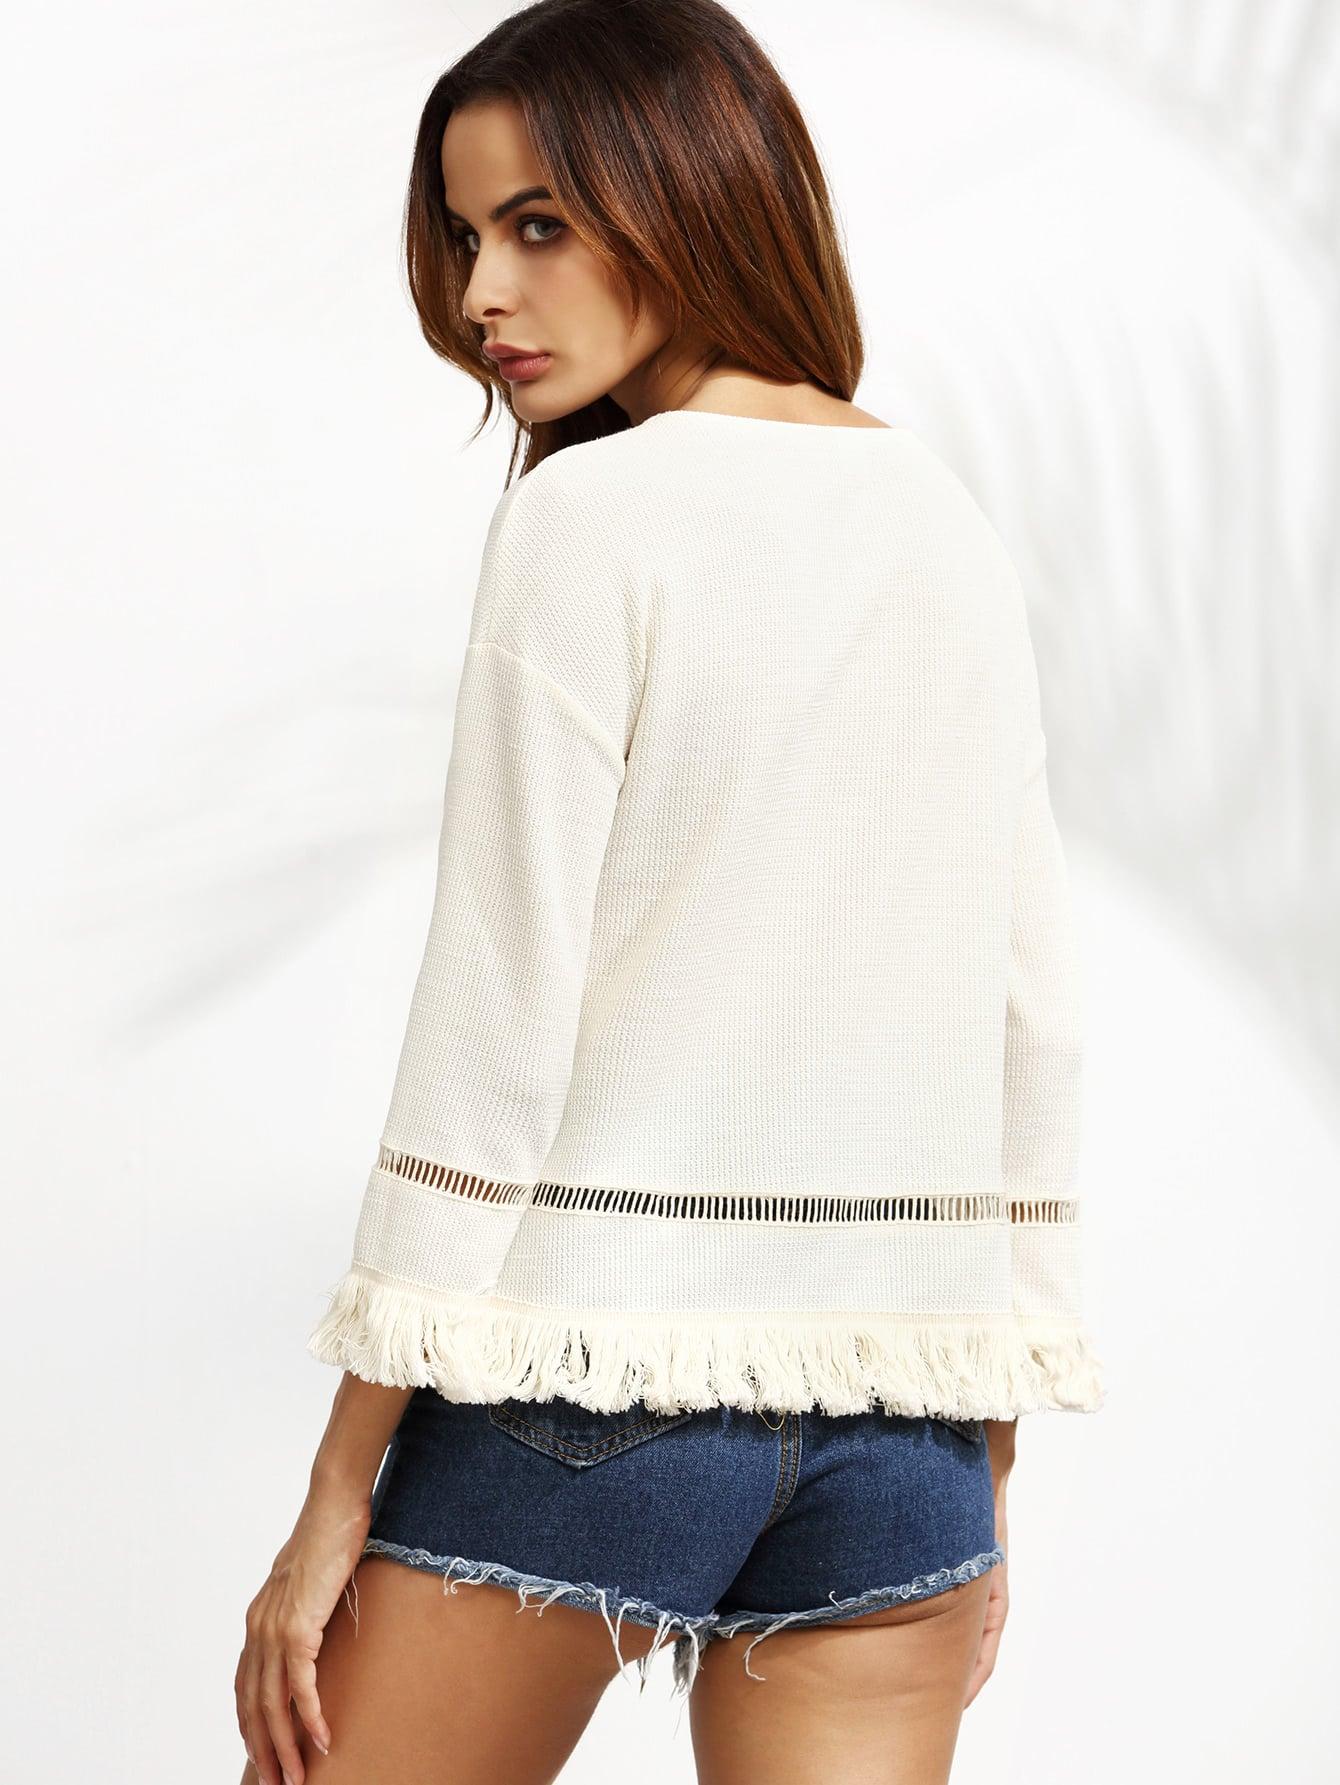 blouse160819501_2